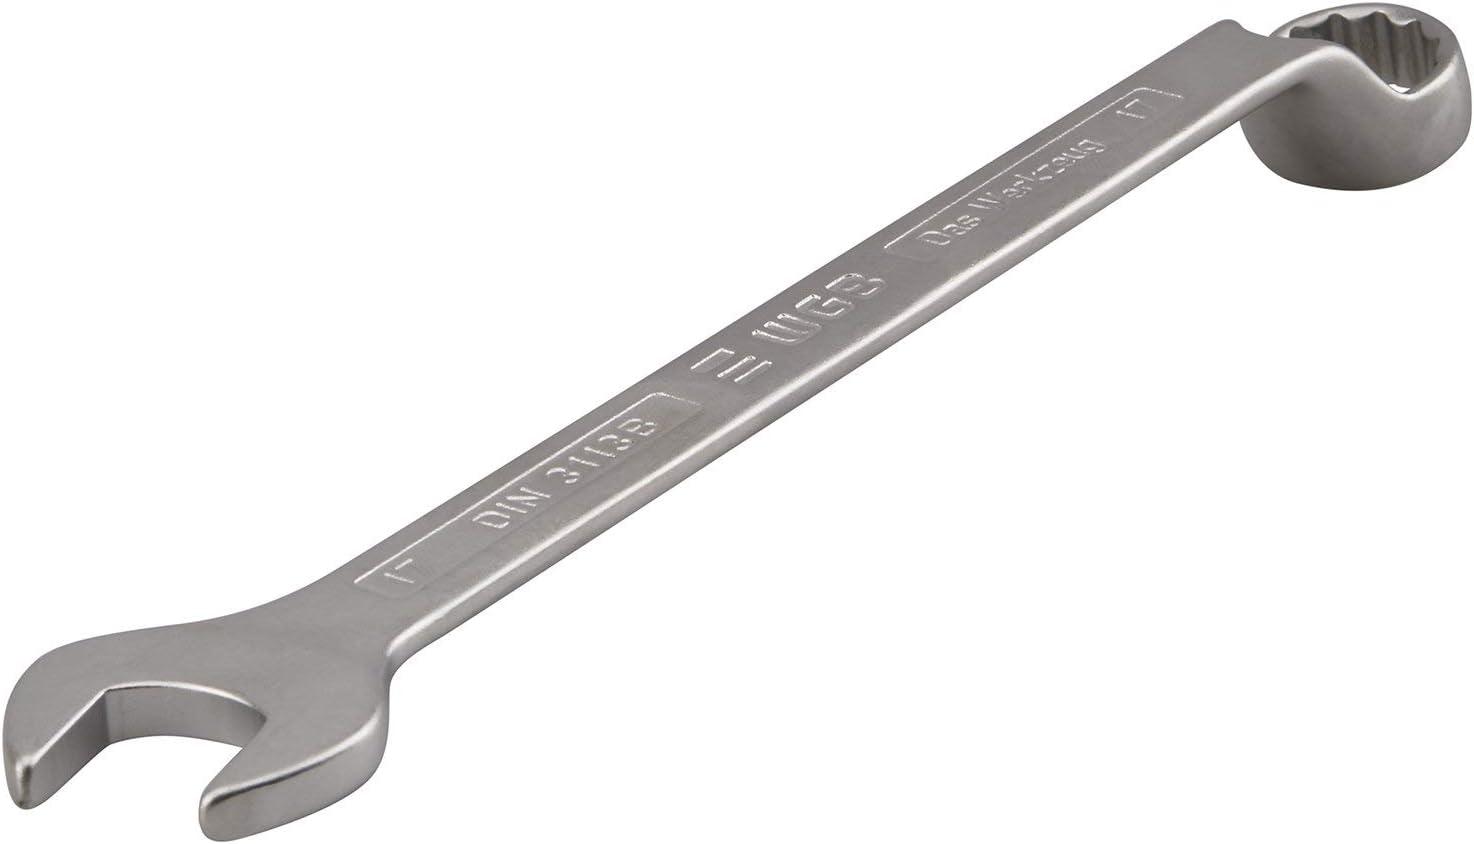 Ringmaulschlüssel DIN 3113 BRingseite tief gekröpftNo.2205 mm